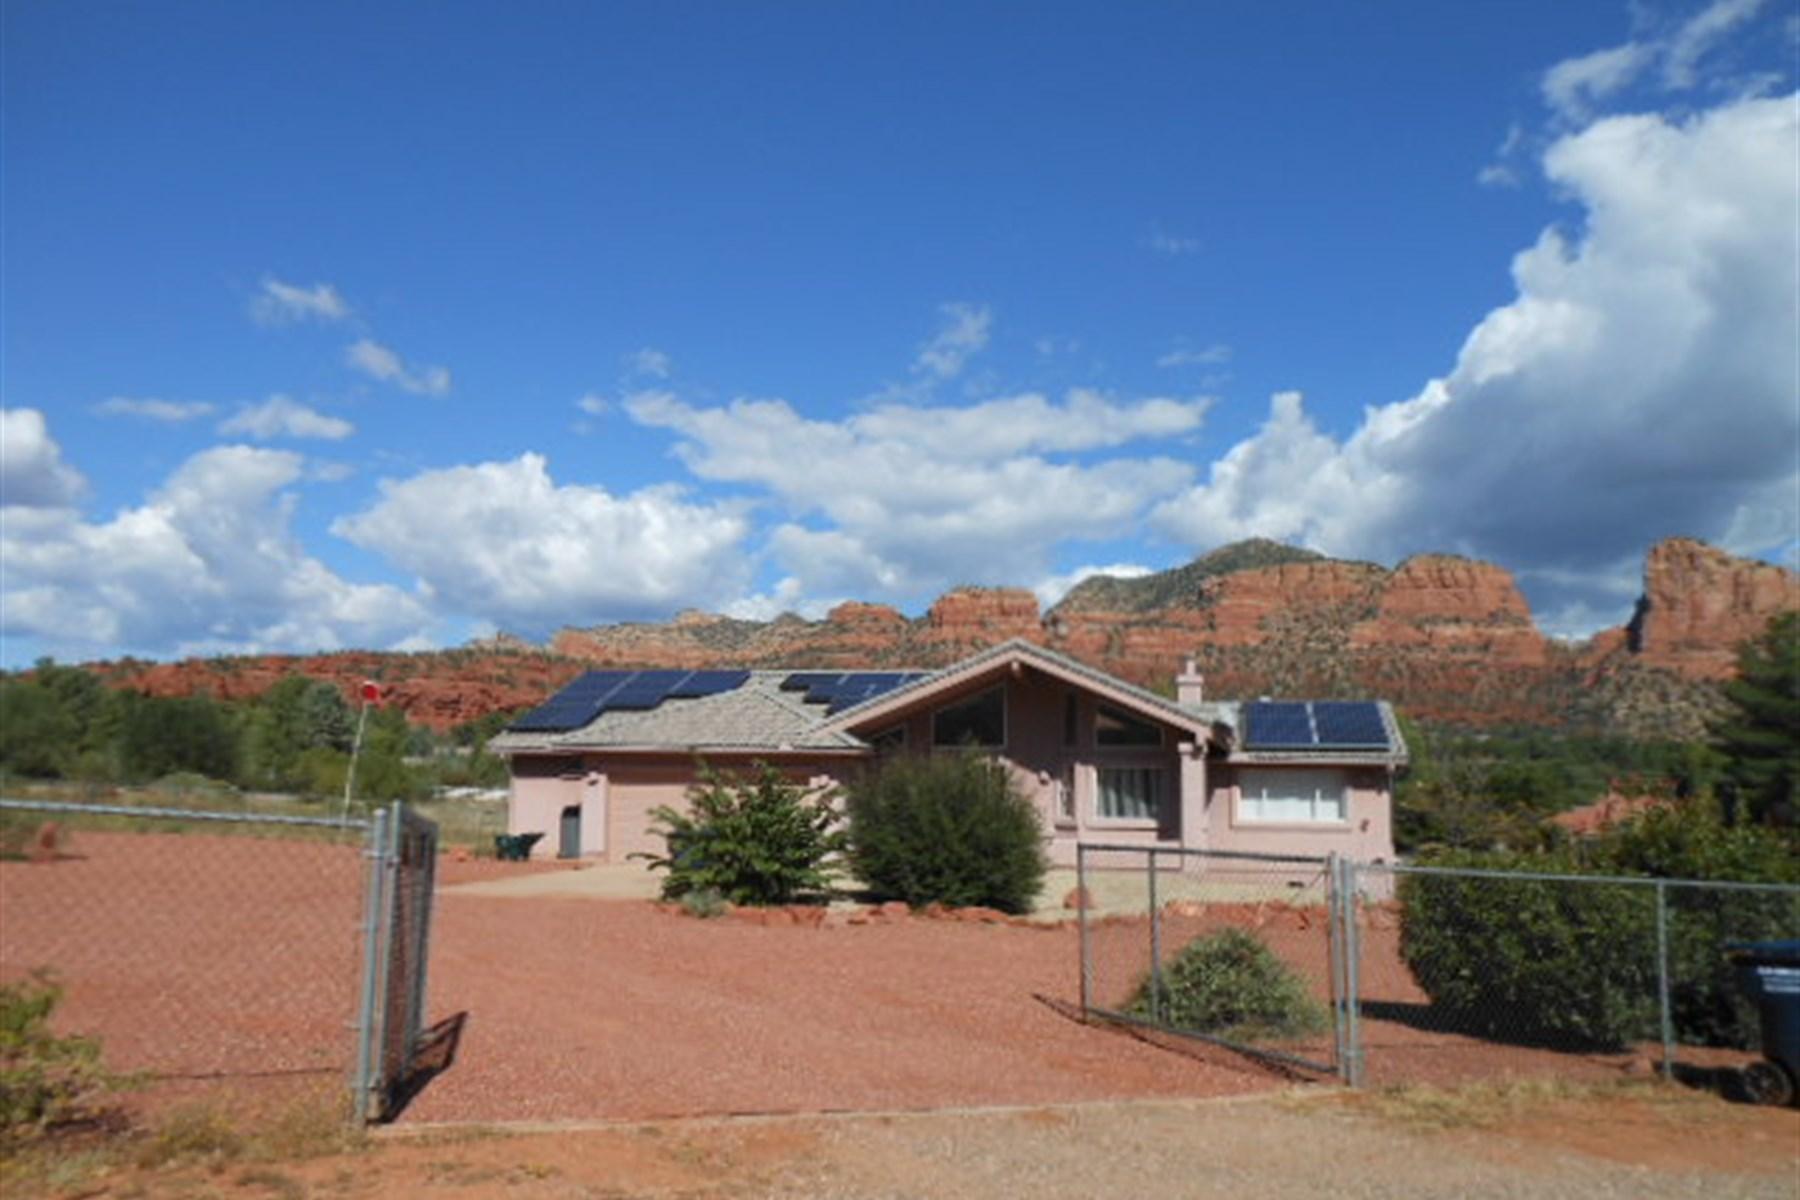 Moradia para Venda às Fully fenced Acre, With Panoramic Red Rock 60 Tilley Ln Sedona, Arizona 86351 Estados Unidos